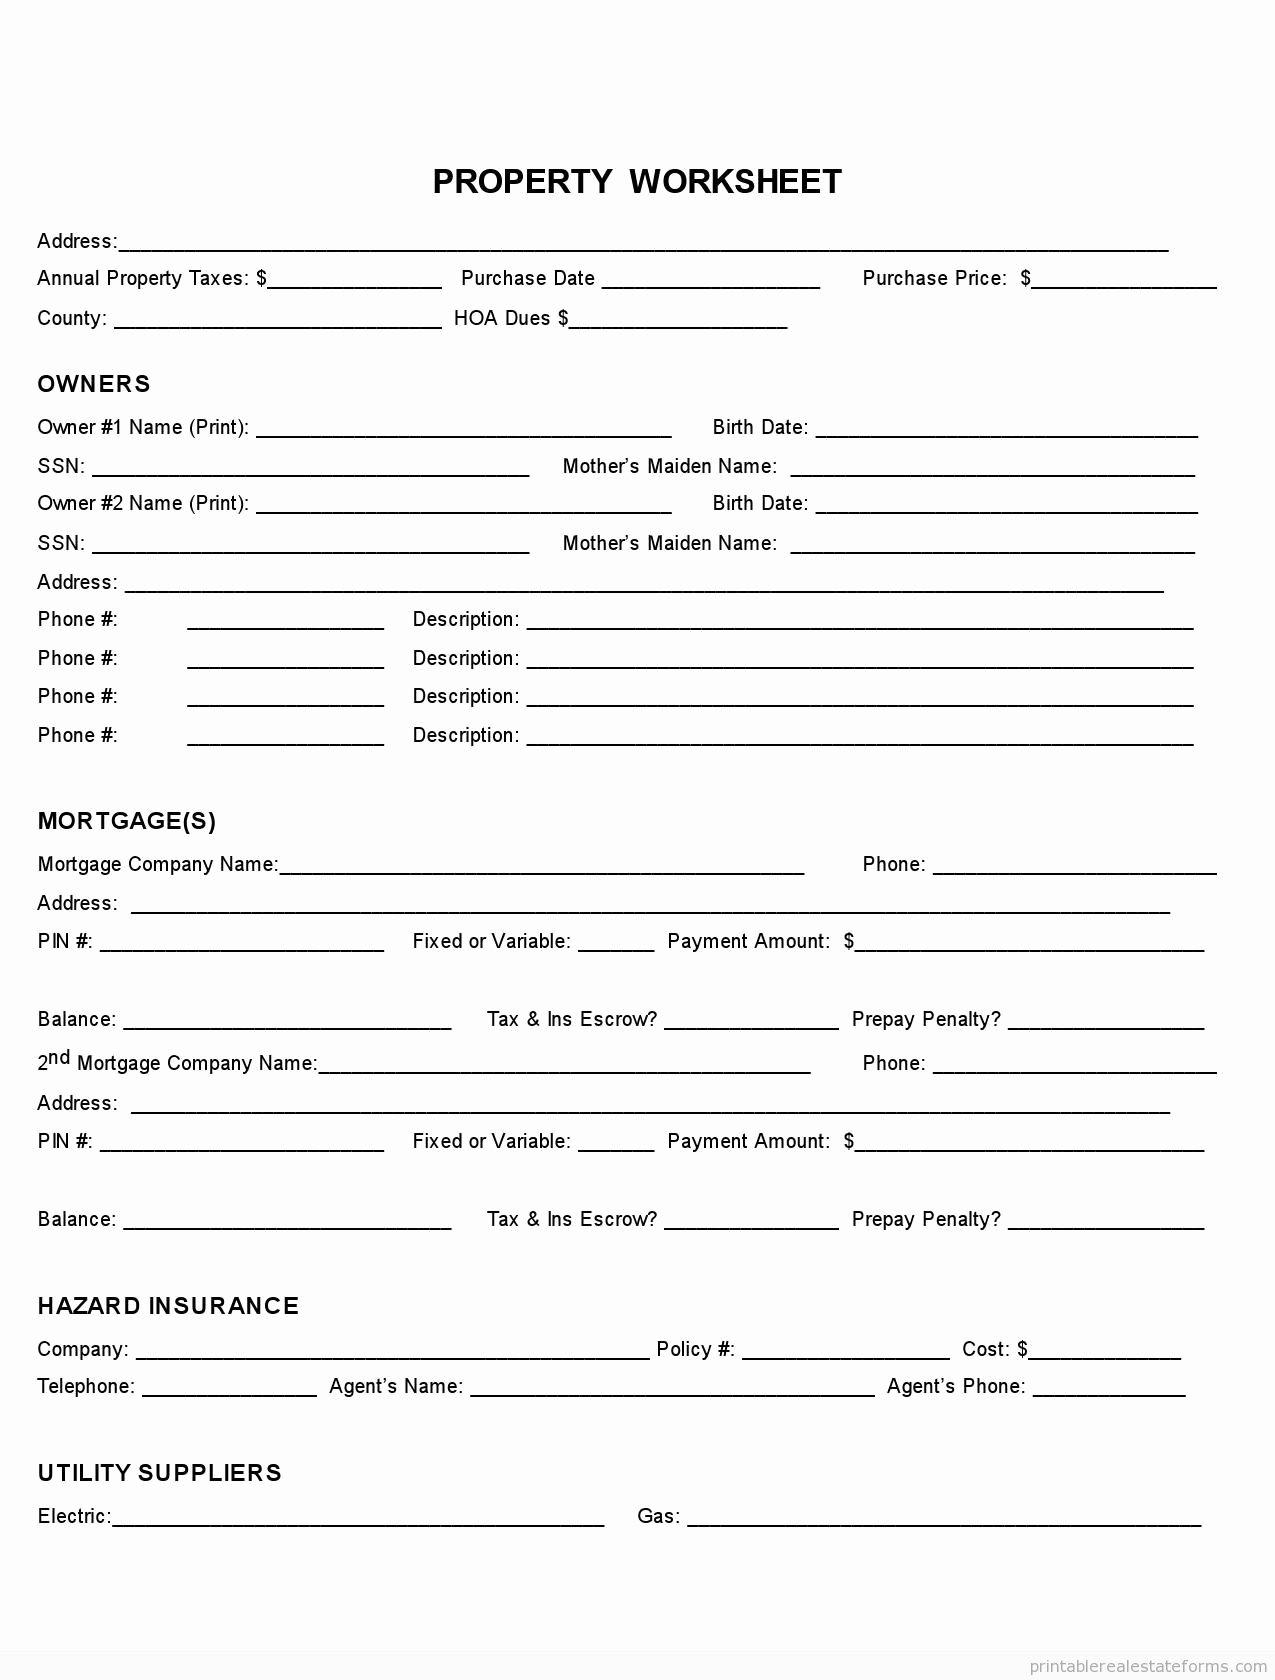 Free Fact Sheet Template Fresh Sample Printable Property Fact Sheet form